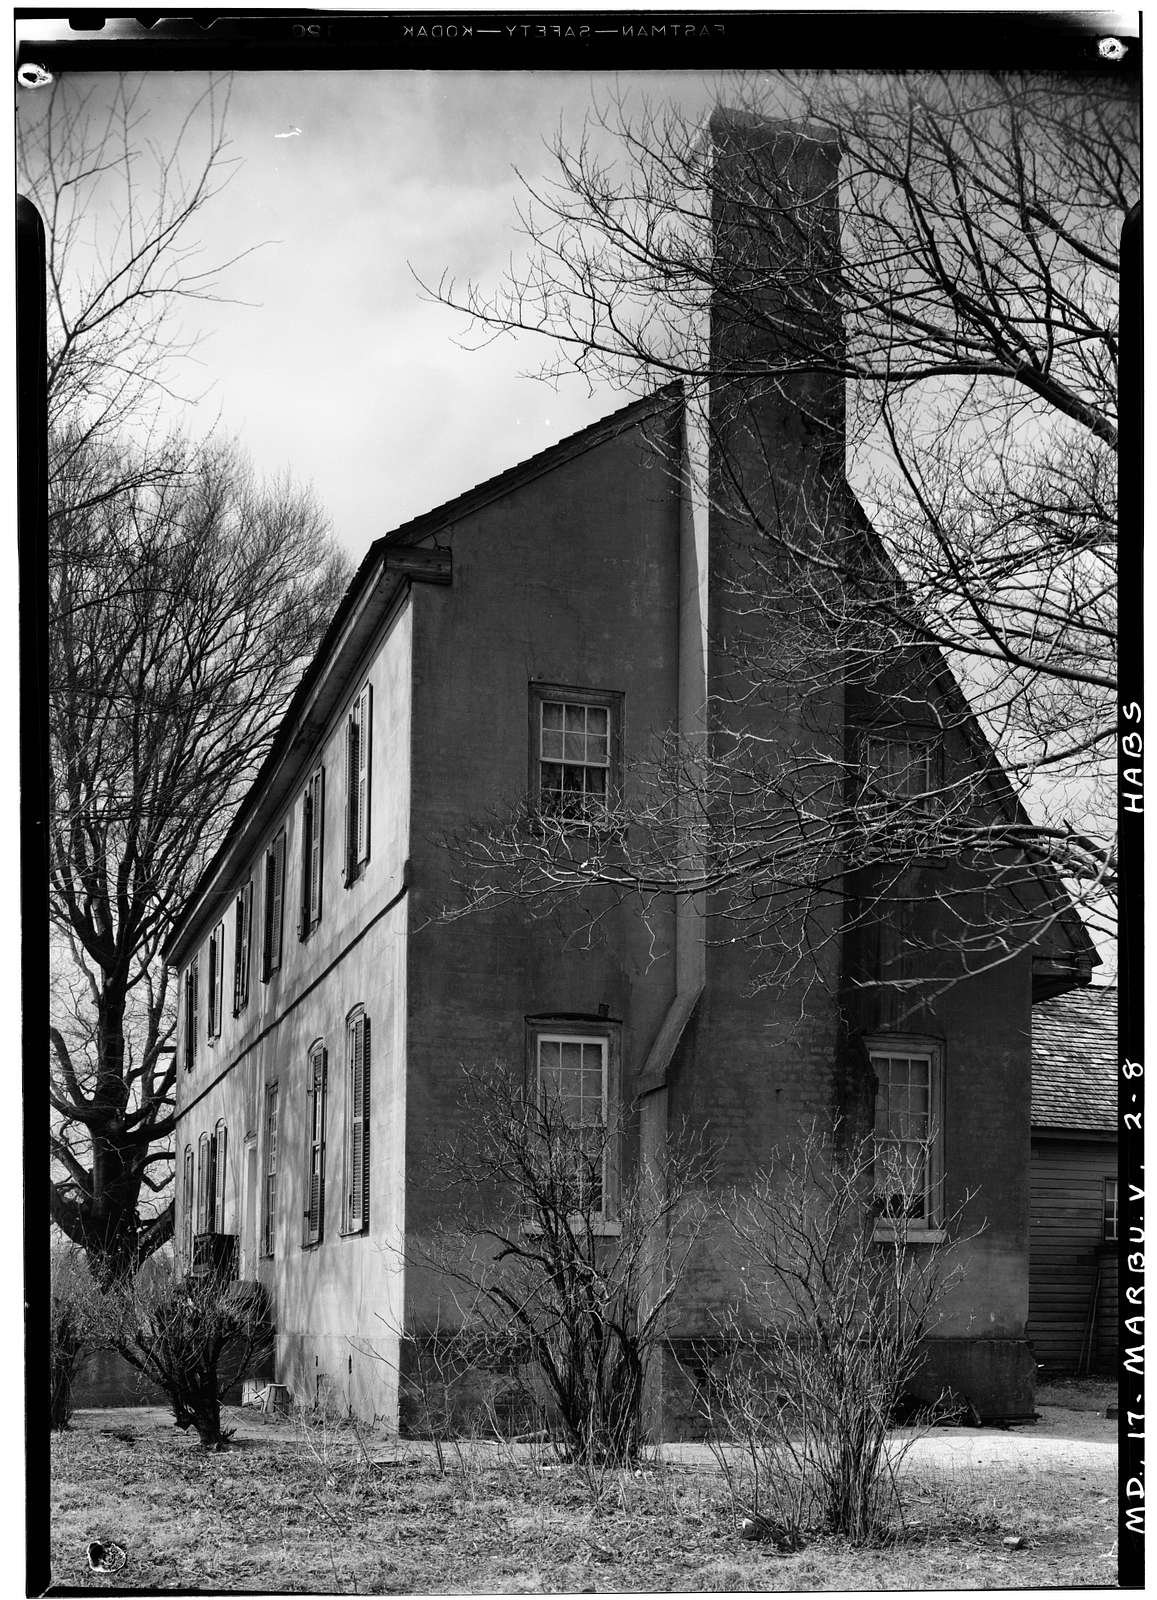 Melwood Park, 11008 Old Marlboro Pike, Upper Marlboro, Prince George's County, MD